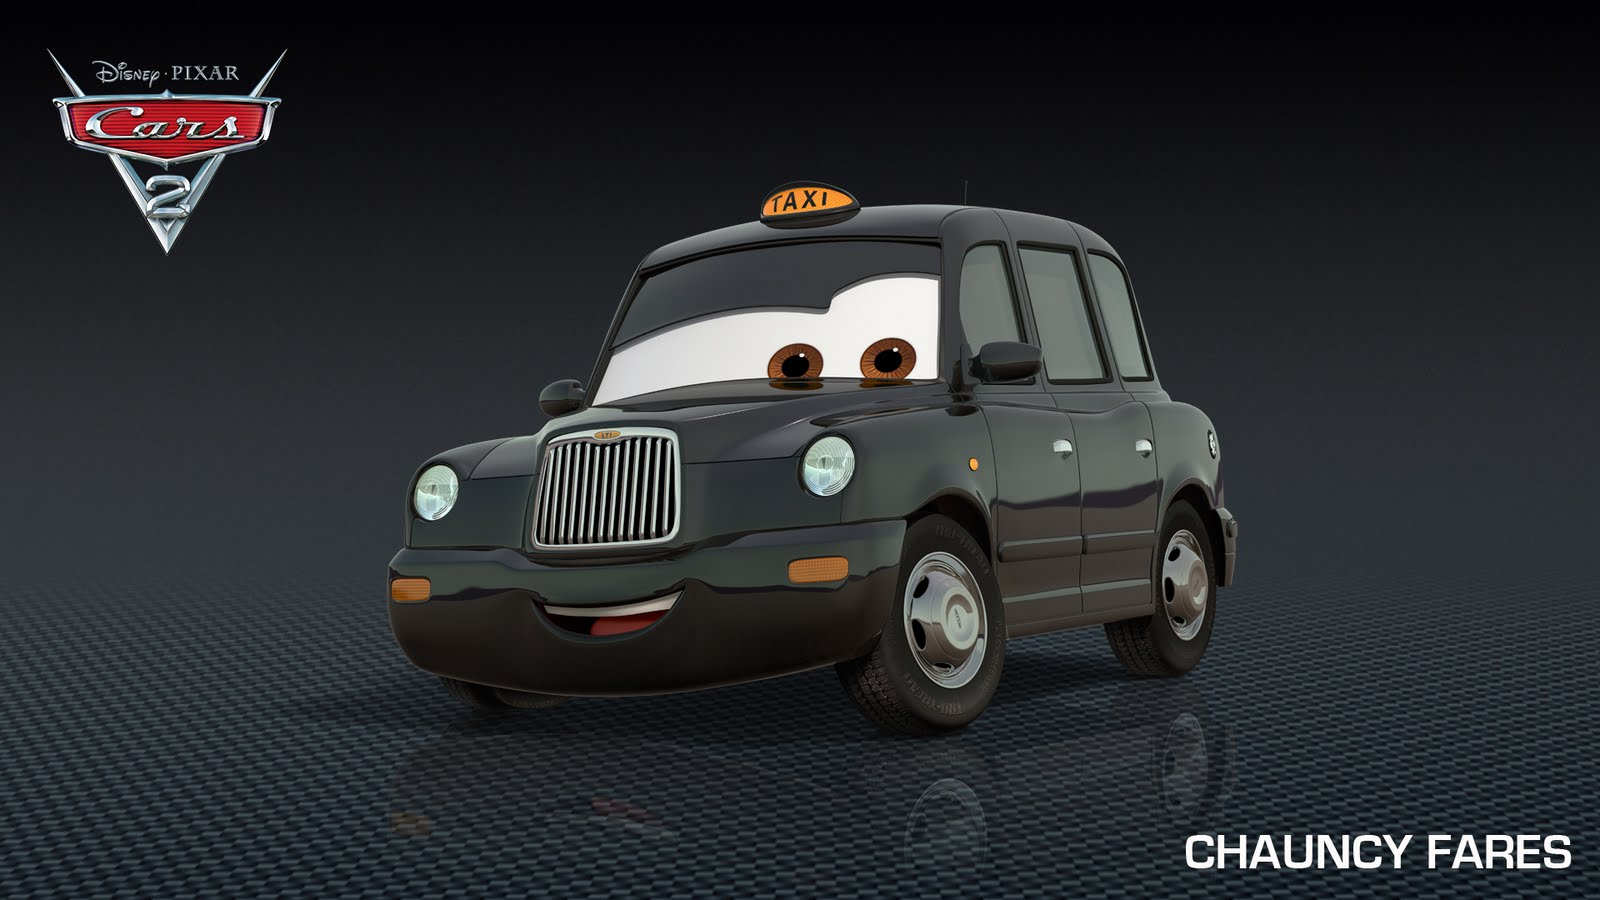 Disney Cars 2 Chauncy Fares